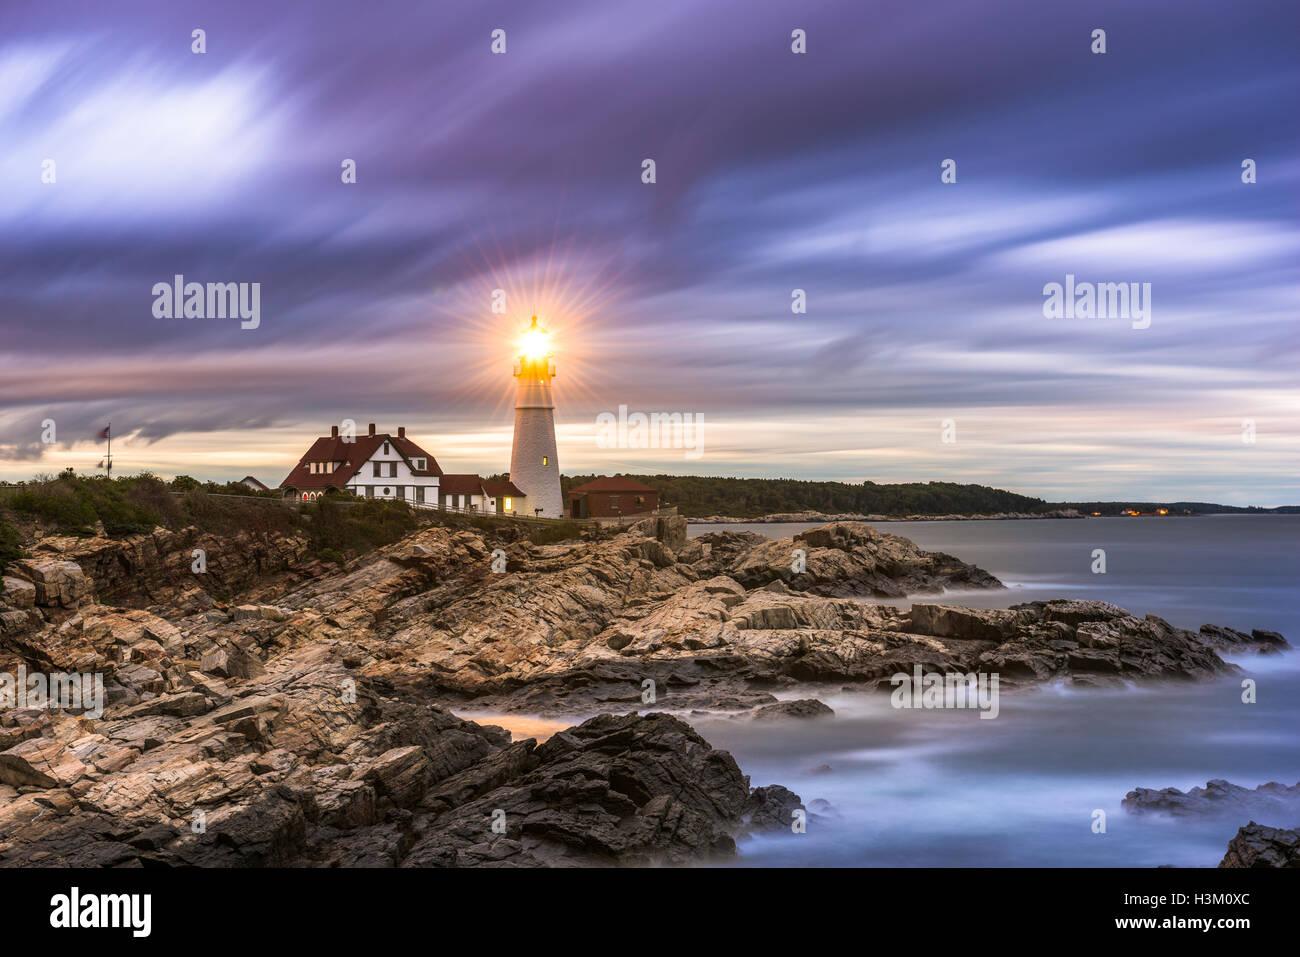 Portland Head Light in Cape Elizabeth, Maine, USA. - Stock Image